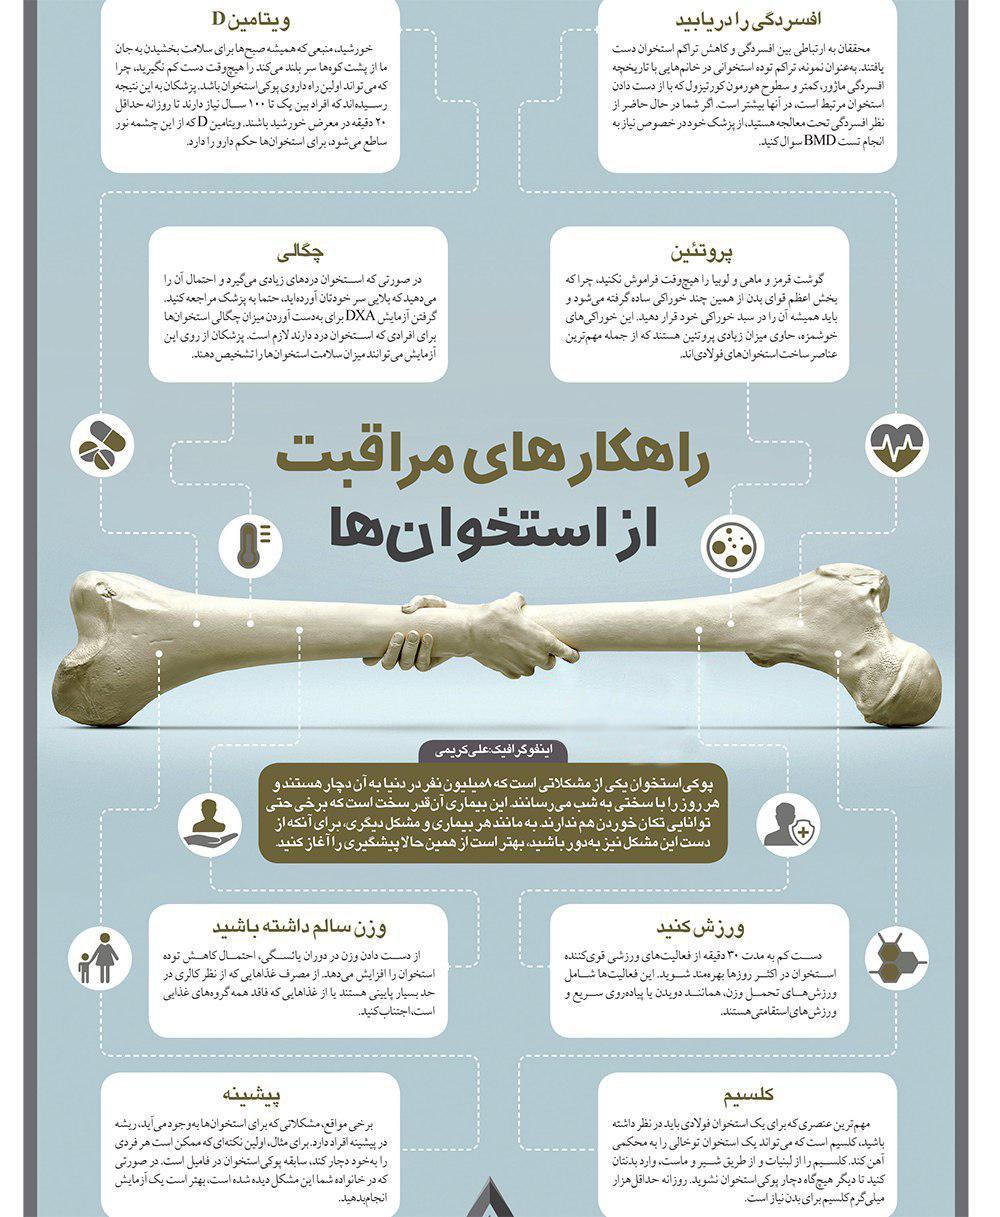 up 2633da24dbb17fa9adfe400bdc9c7d2e نکات طلایی برای پیشگیری از پوکی استخوان+ اینفوگرافی   پیشگیری   مراقبت سلامت